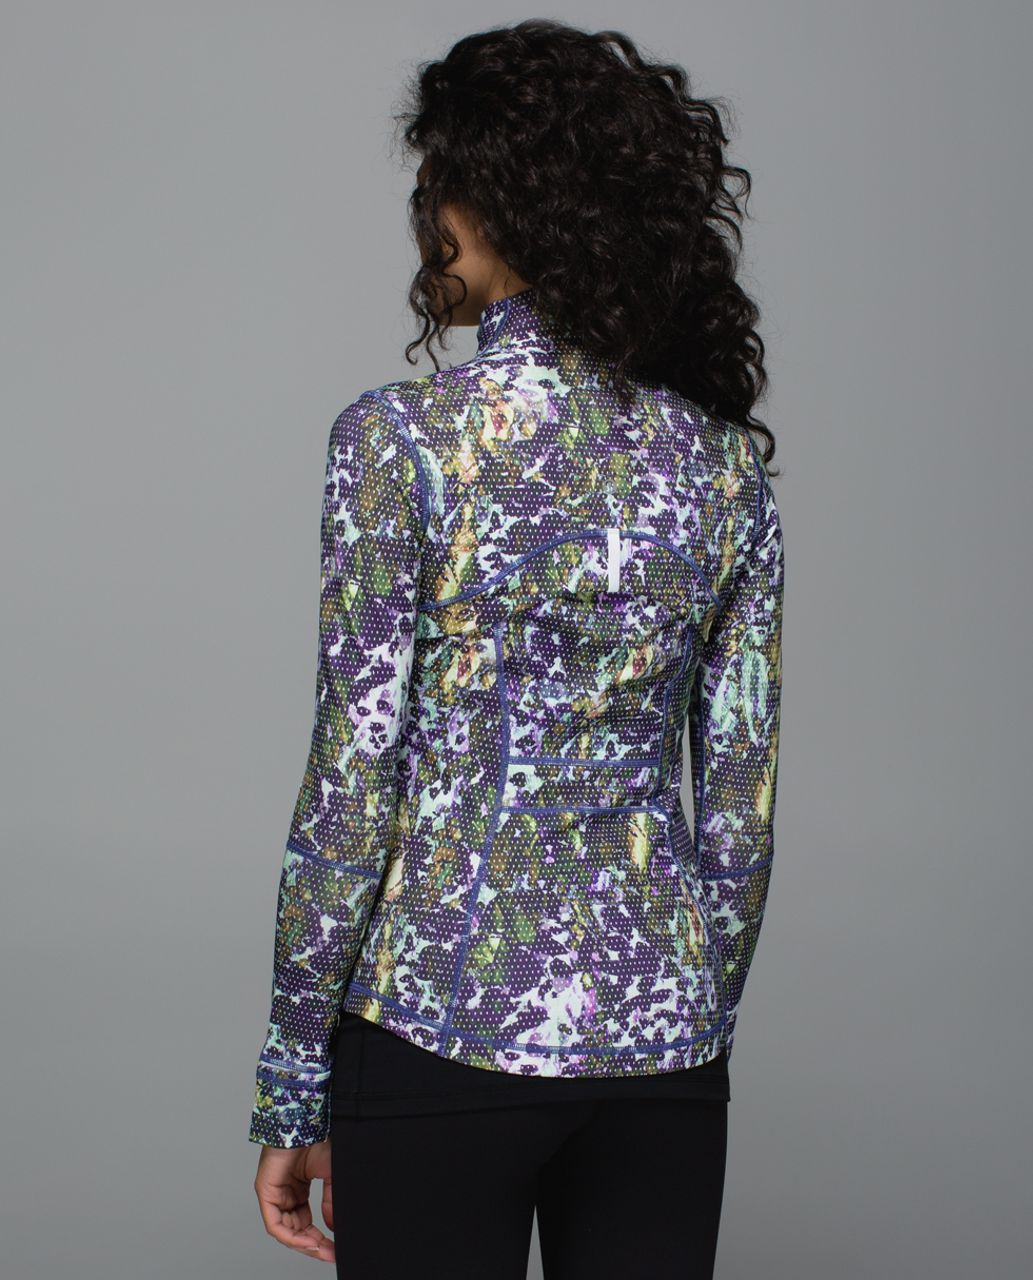 Lululemon Define Jacket - Floral Sport White Multi